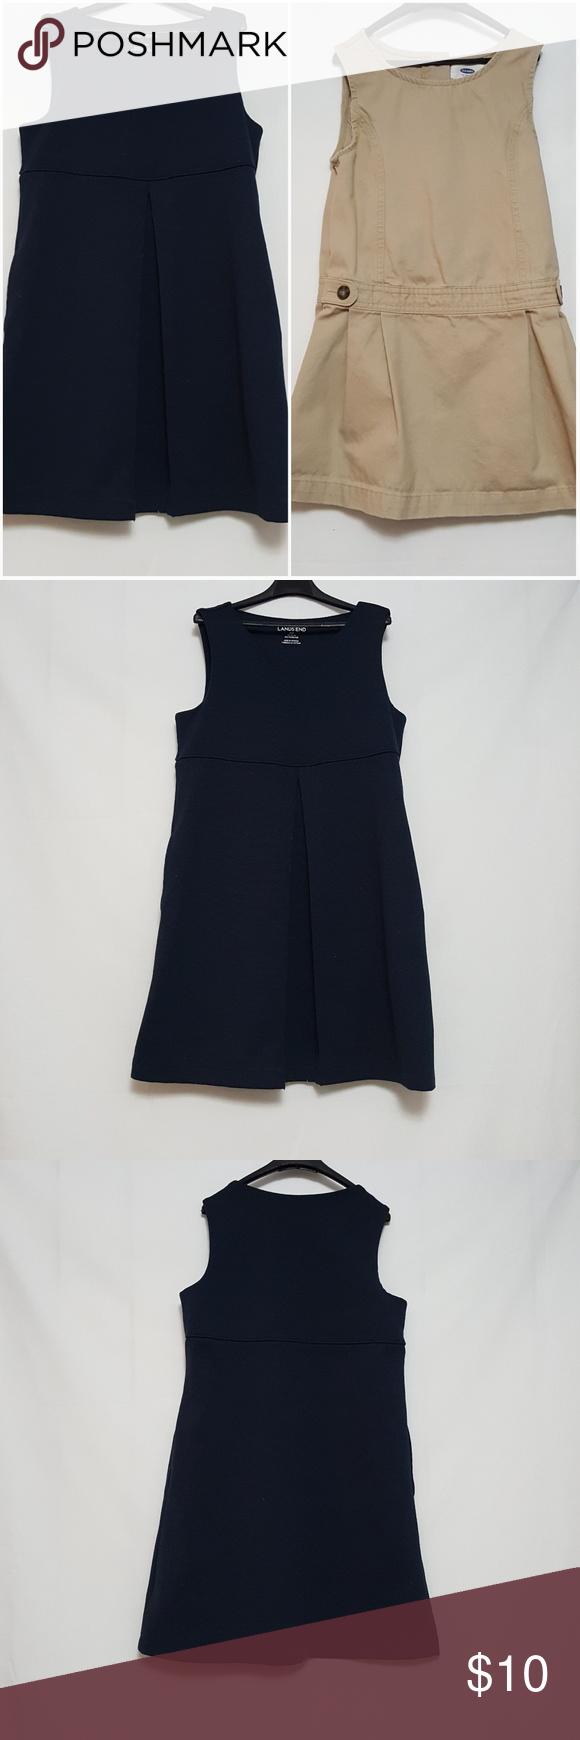 Girls uniform dresses khaki and navy blue my posh closet